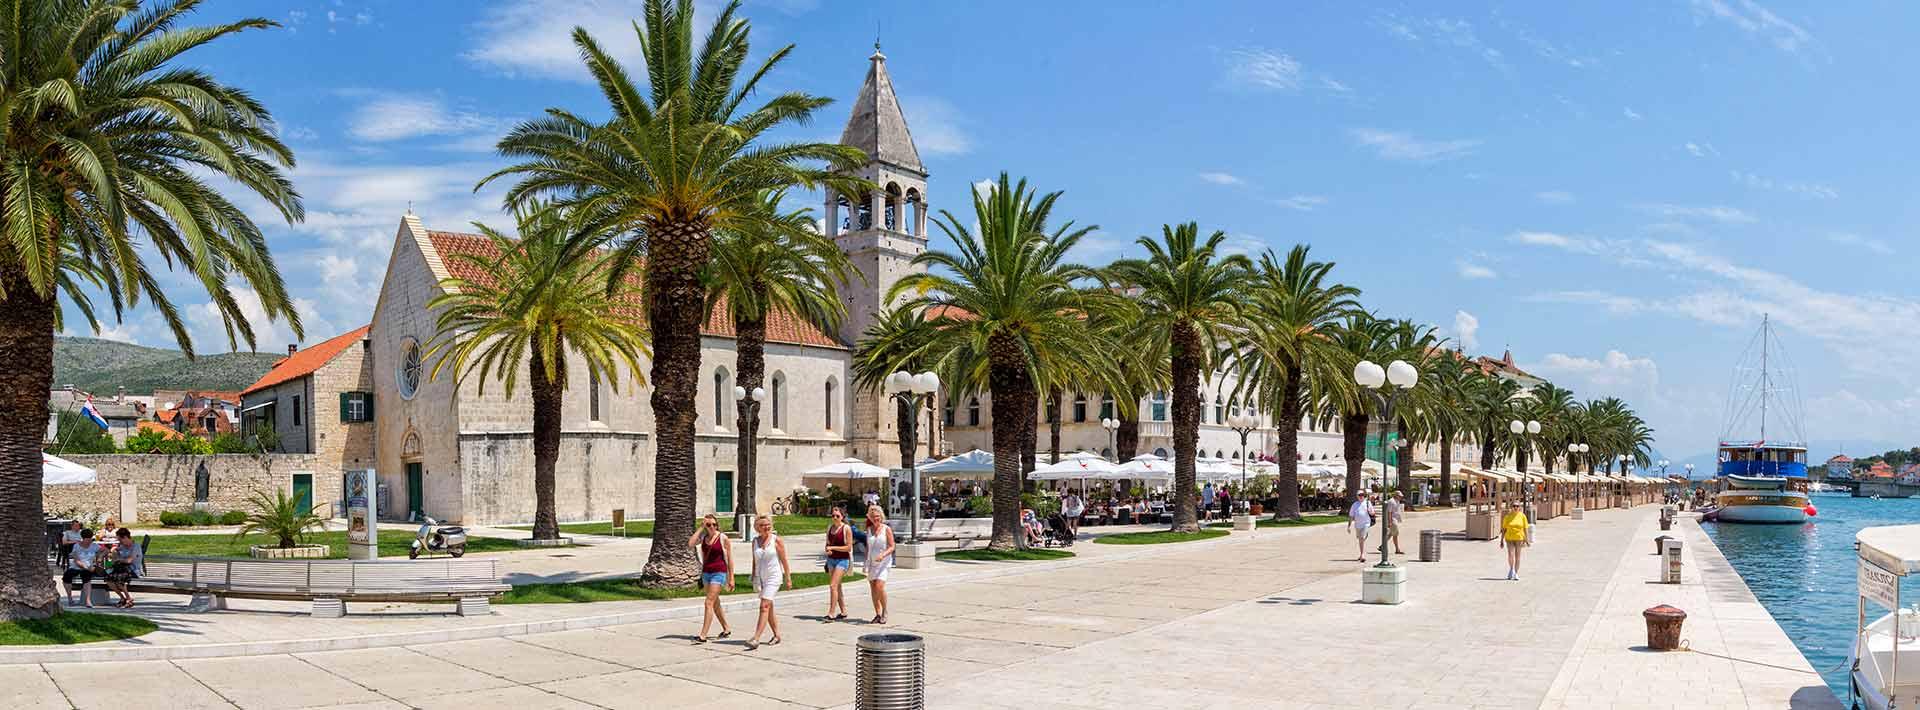 Trogir, UNESCO World Heritage Site, promenade